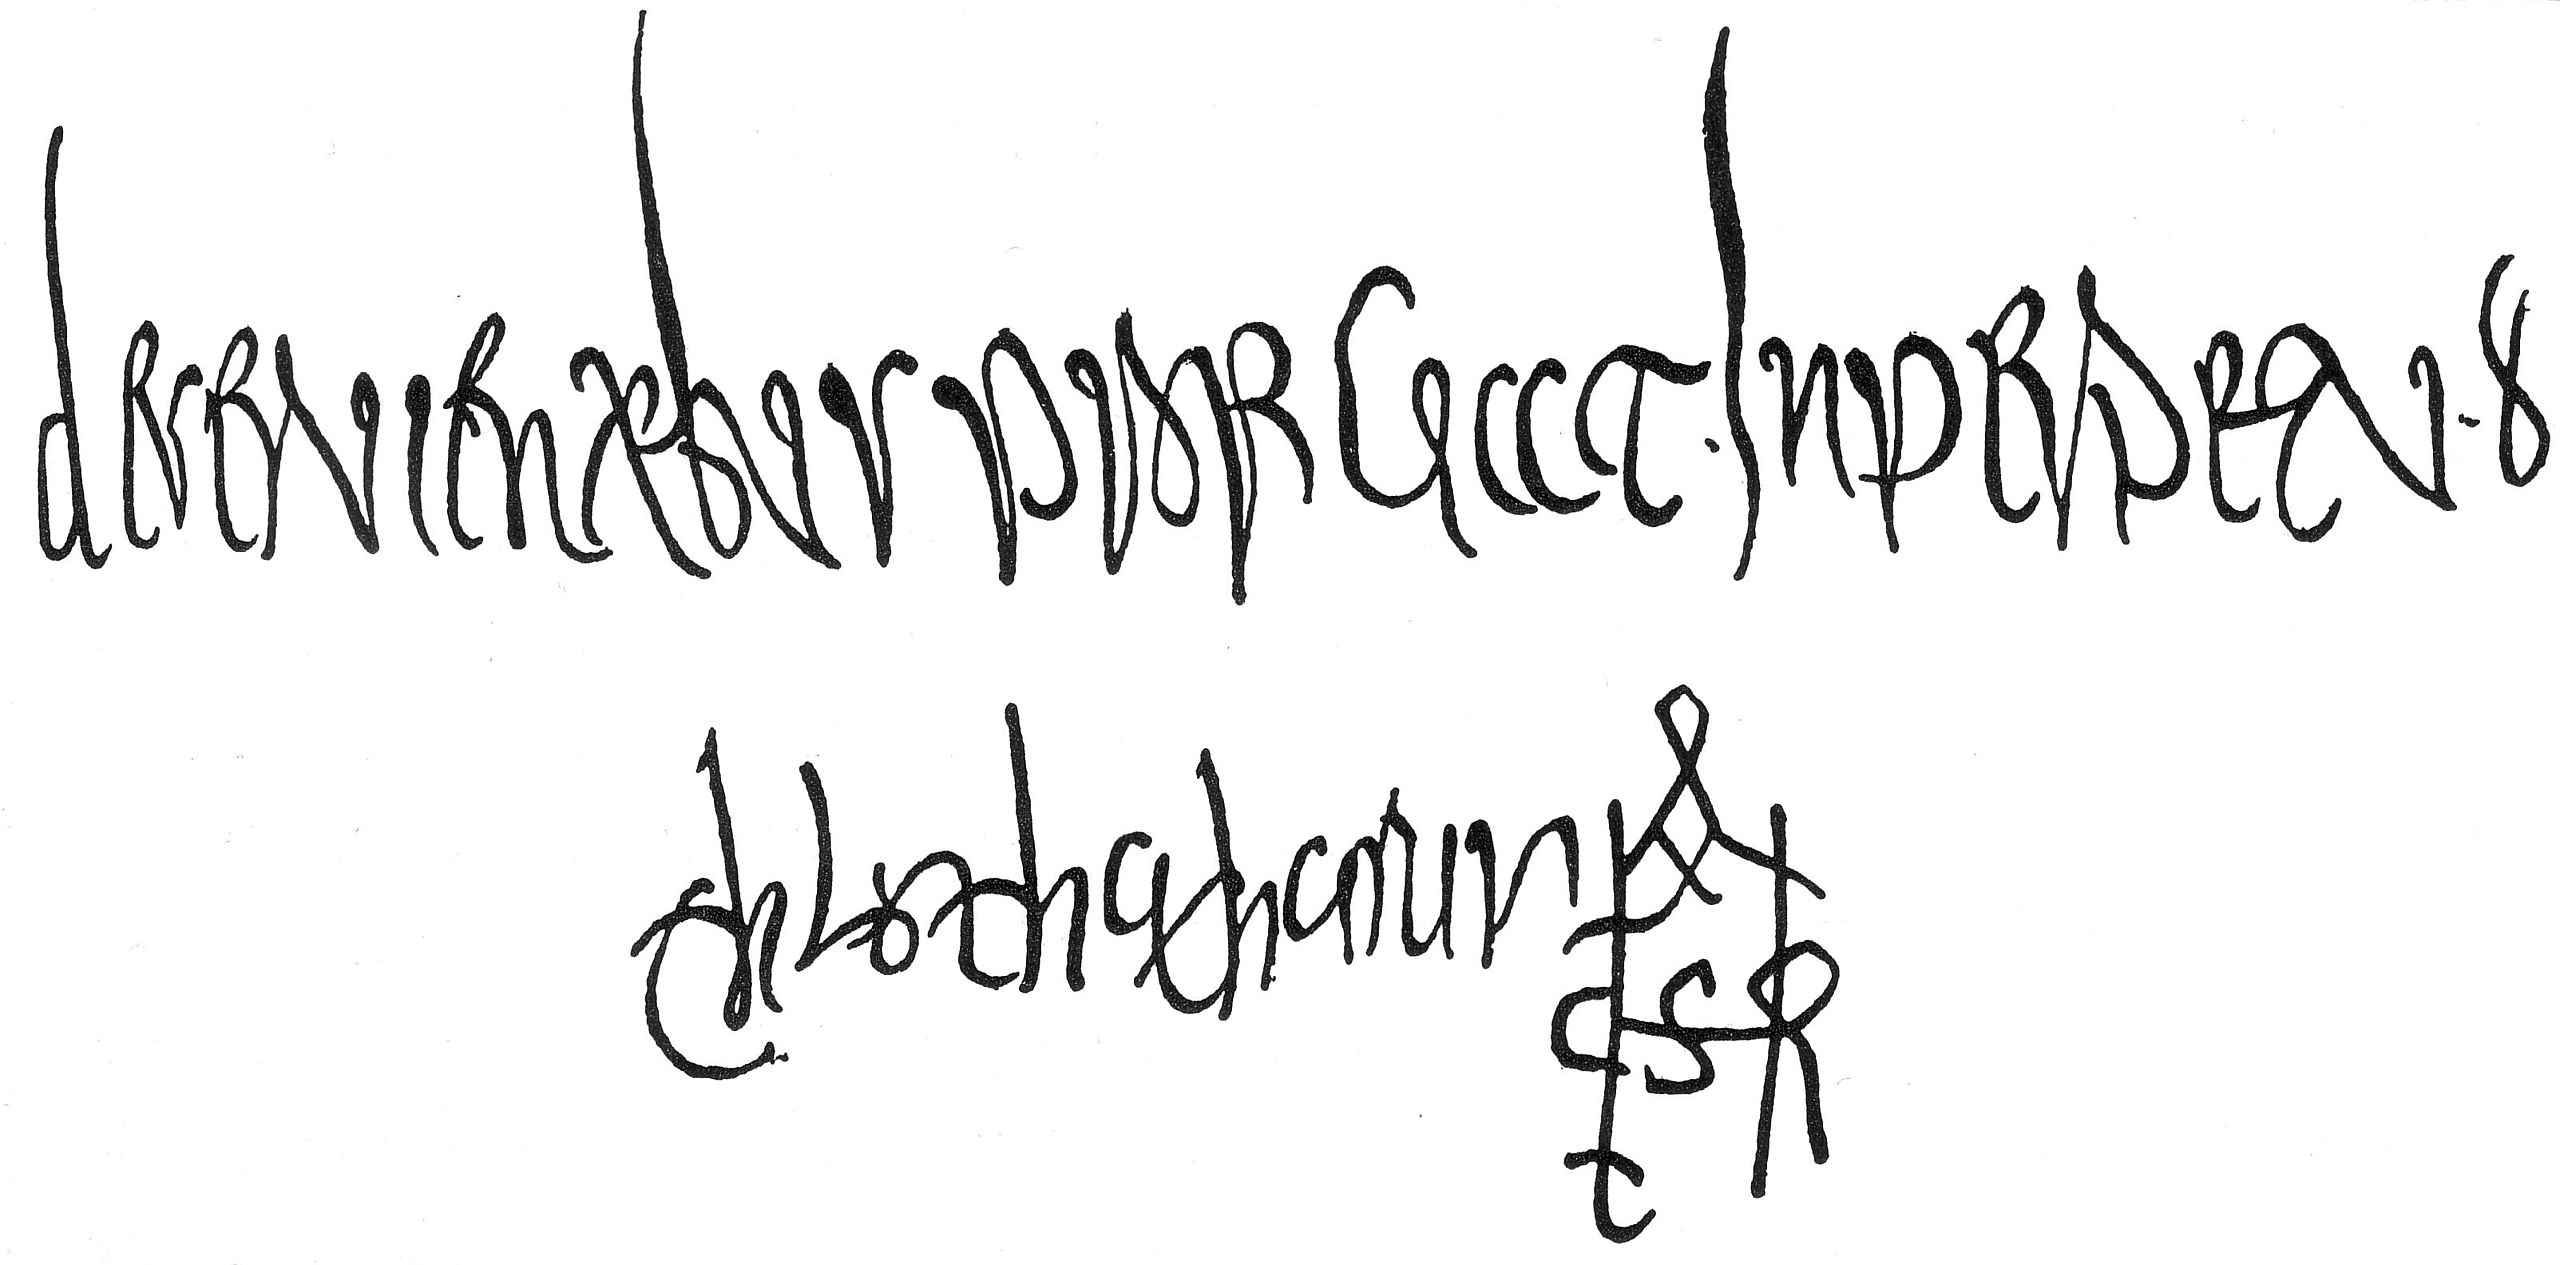 Clothar's signature